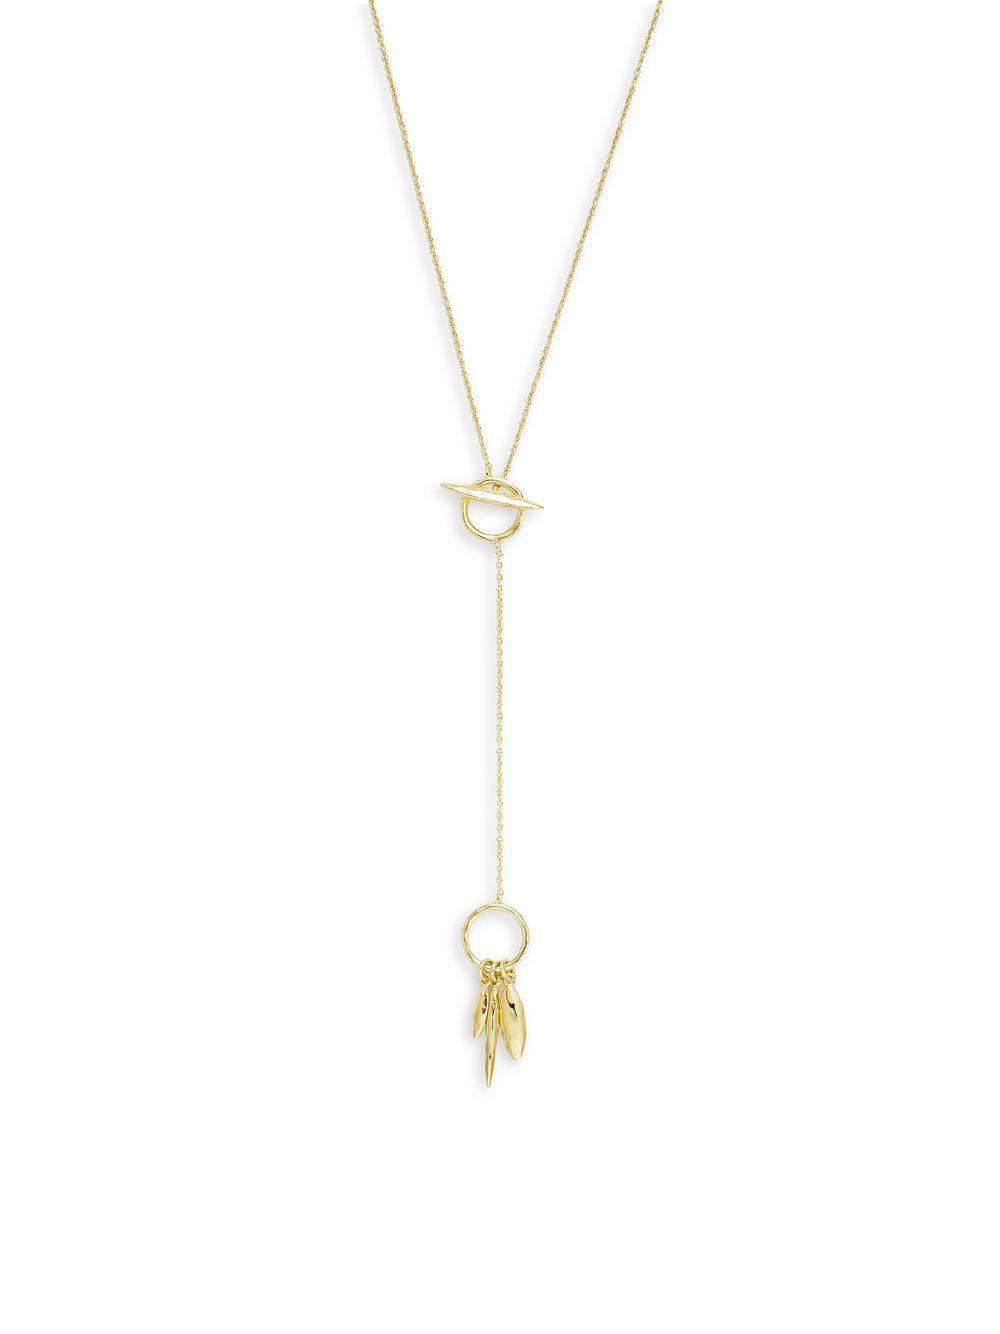 Necklaces & Pendants Gorjana Necklaces Gold Tone Link Oval Y Necklaces Women New